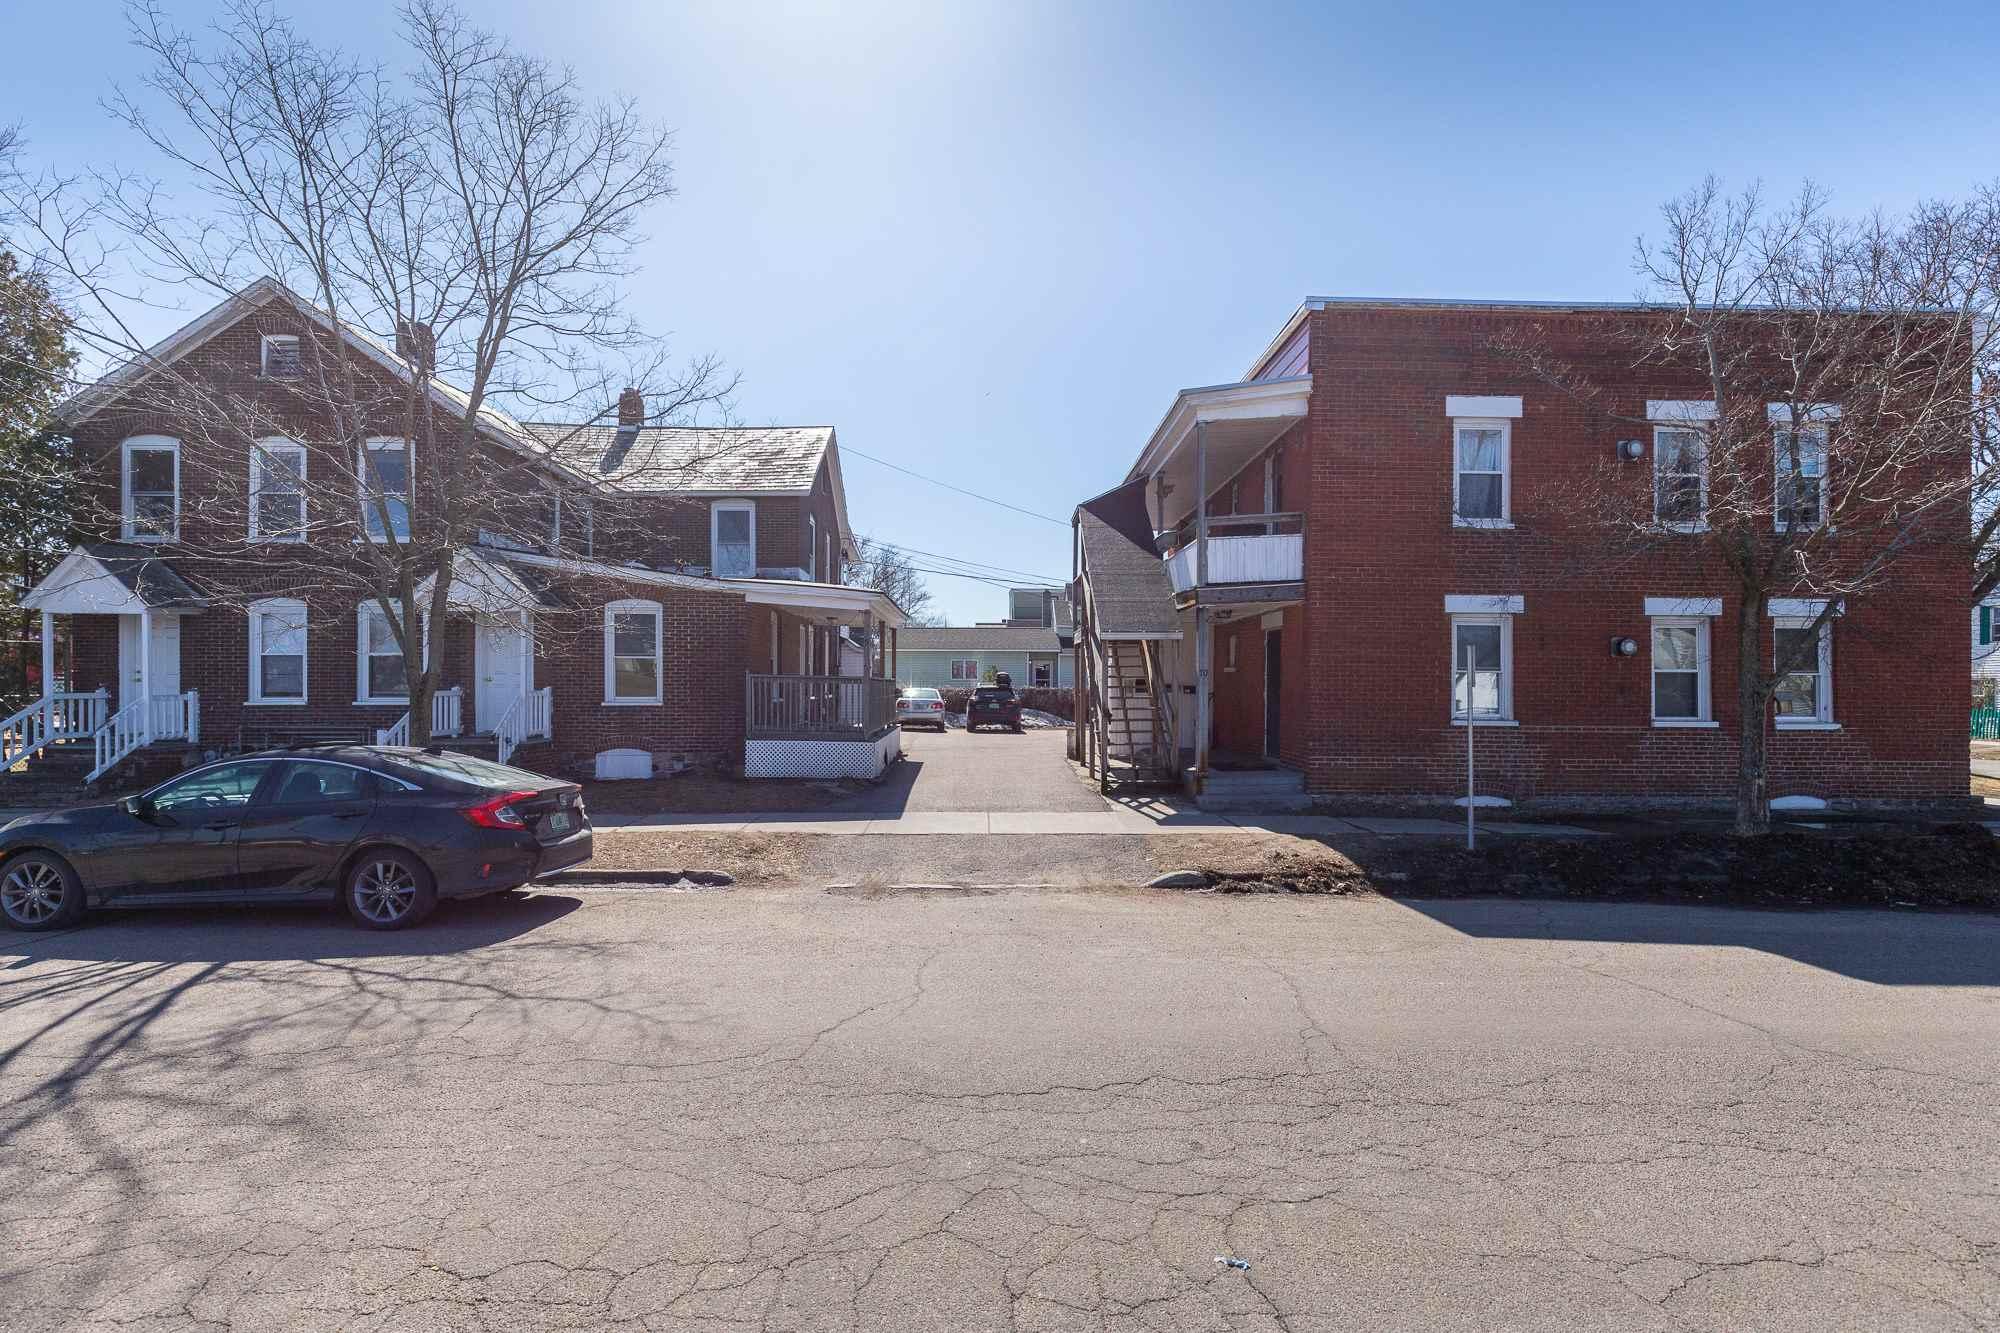 Photo of 1 Willow Street Burlington VT 05401